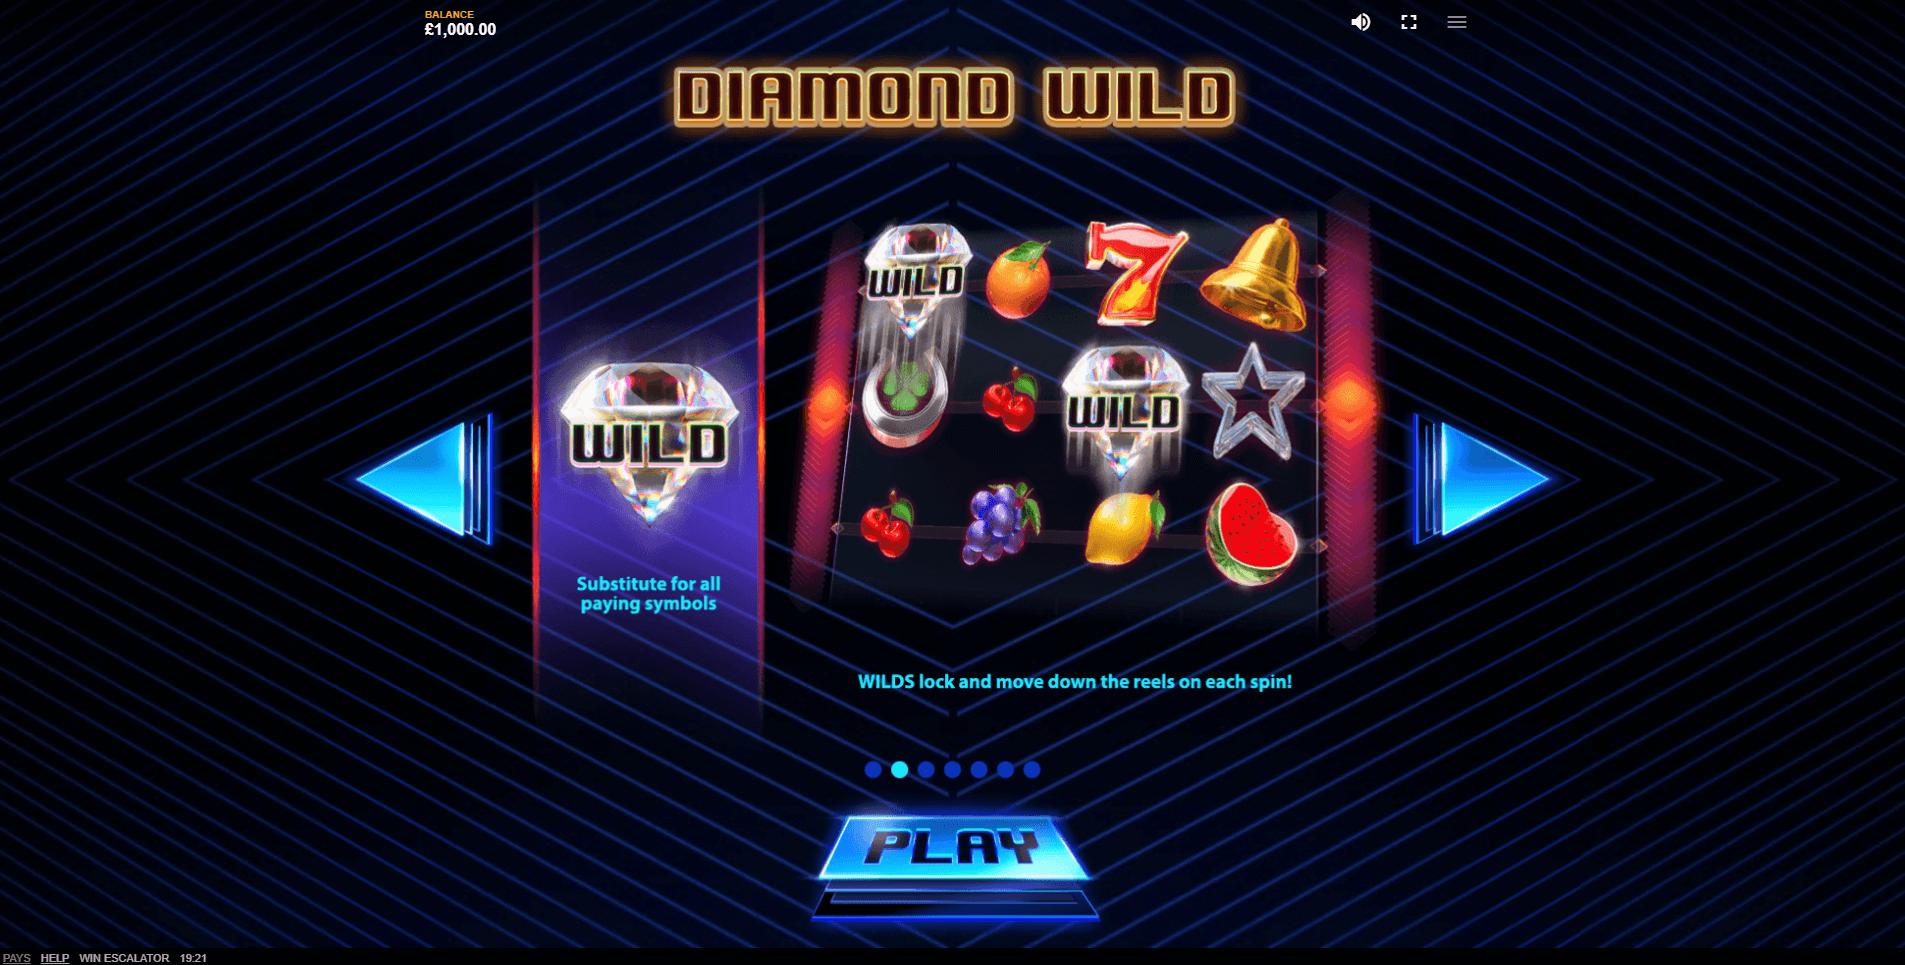 Win Escalator Slot Machine